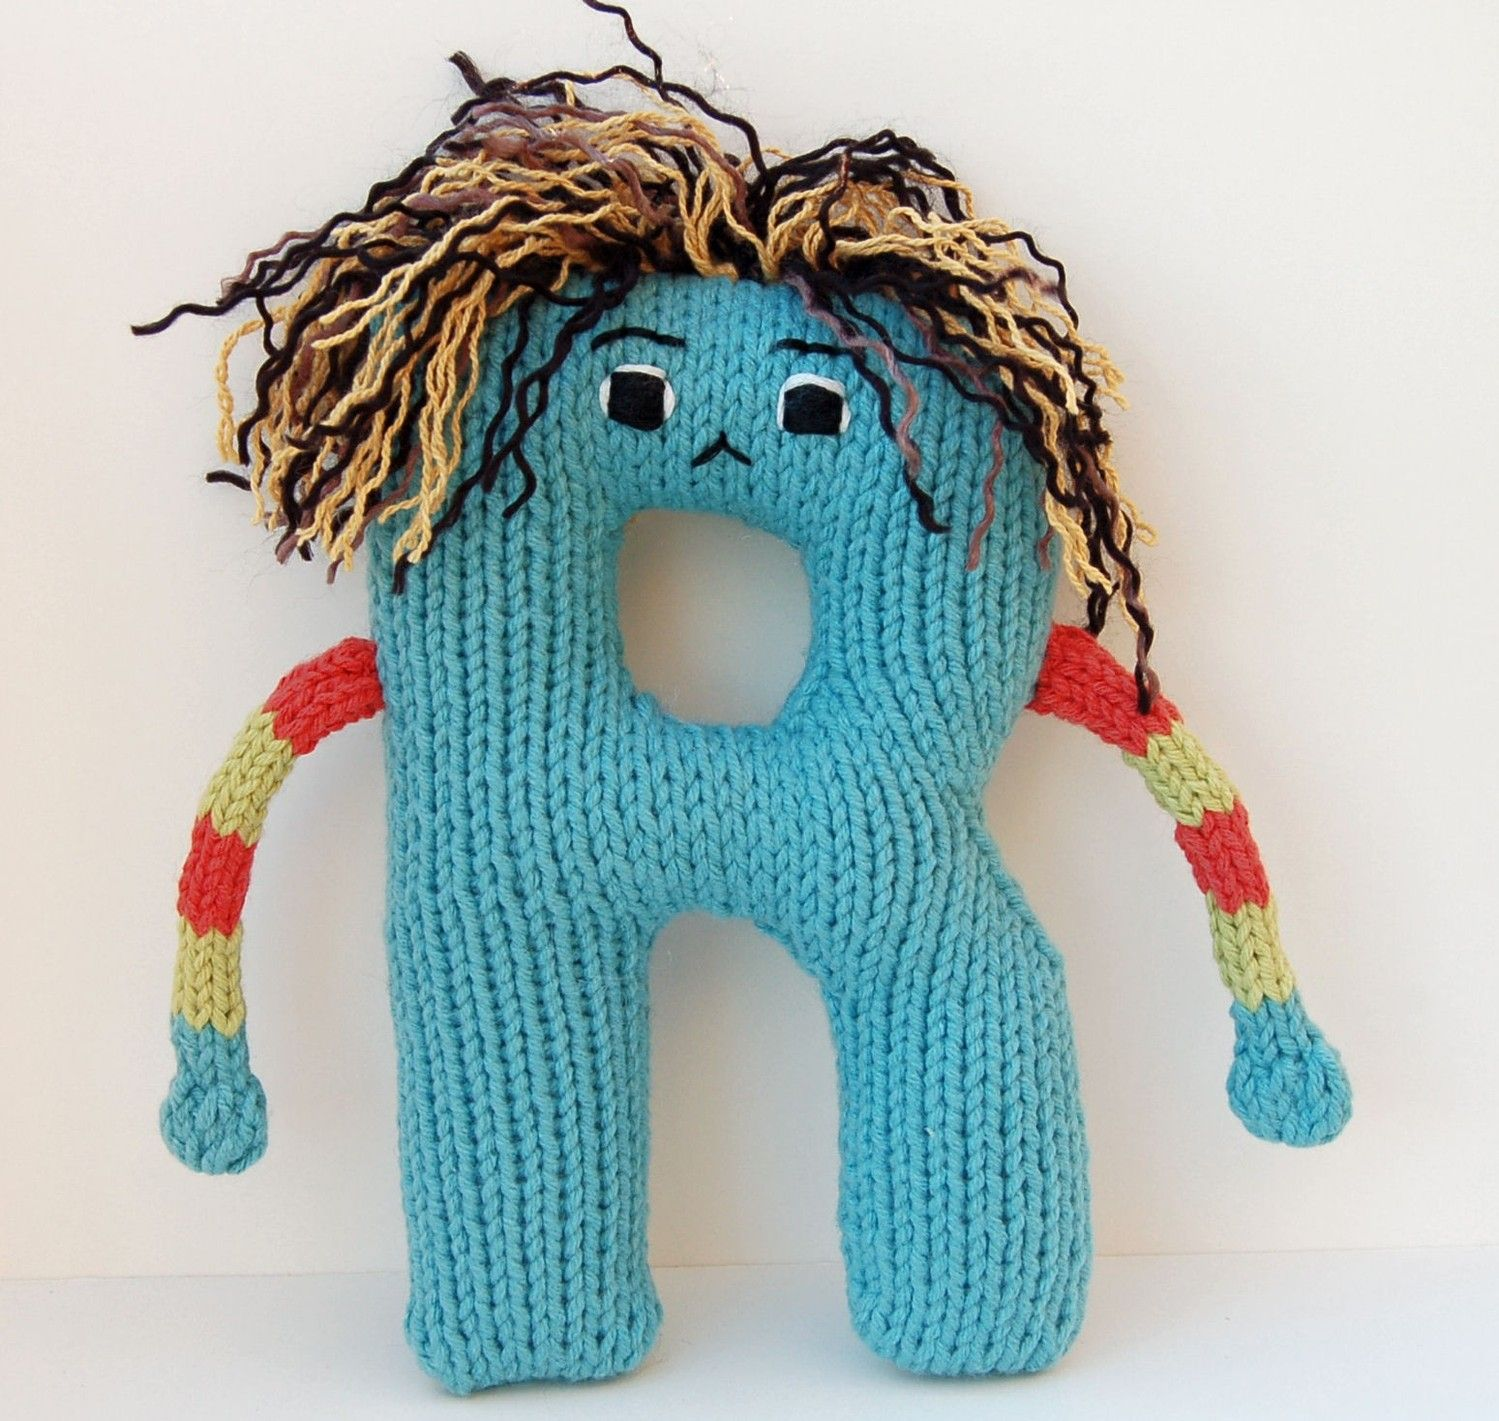 Letter r alphabet stuffed toy knitting pattern rodney 300 letter r alphabet stuffed toy knitting pattern rodney 300 via etsy bankloansurffo Choice Image